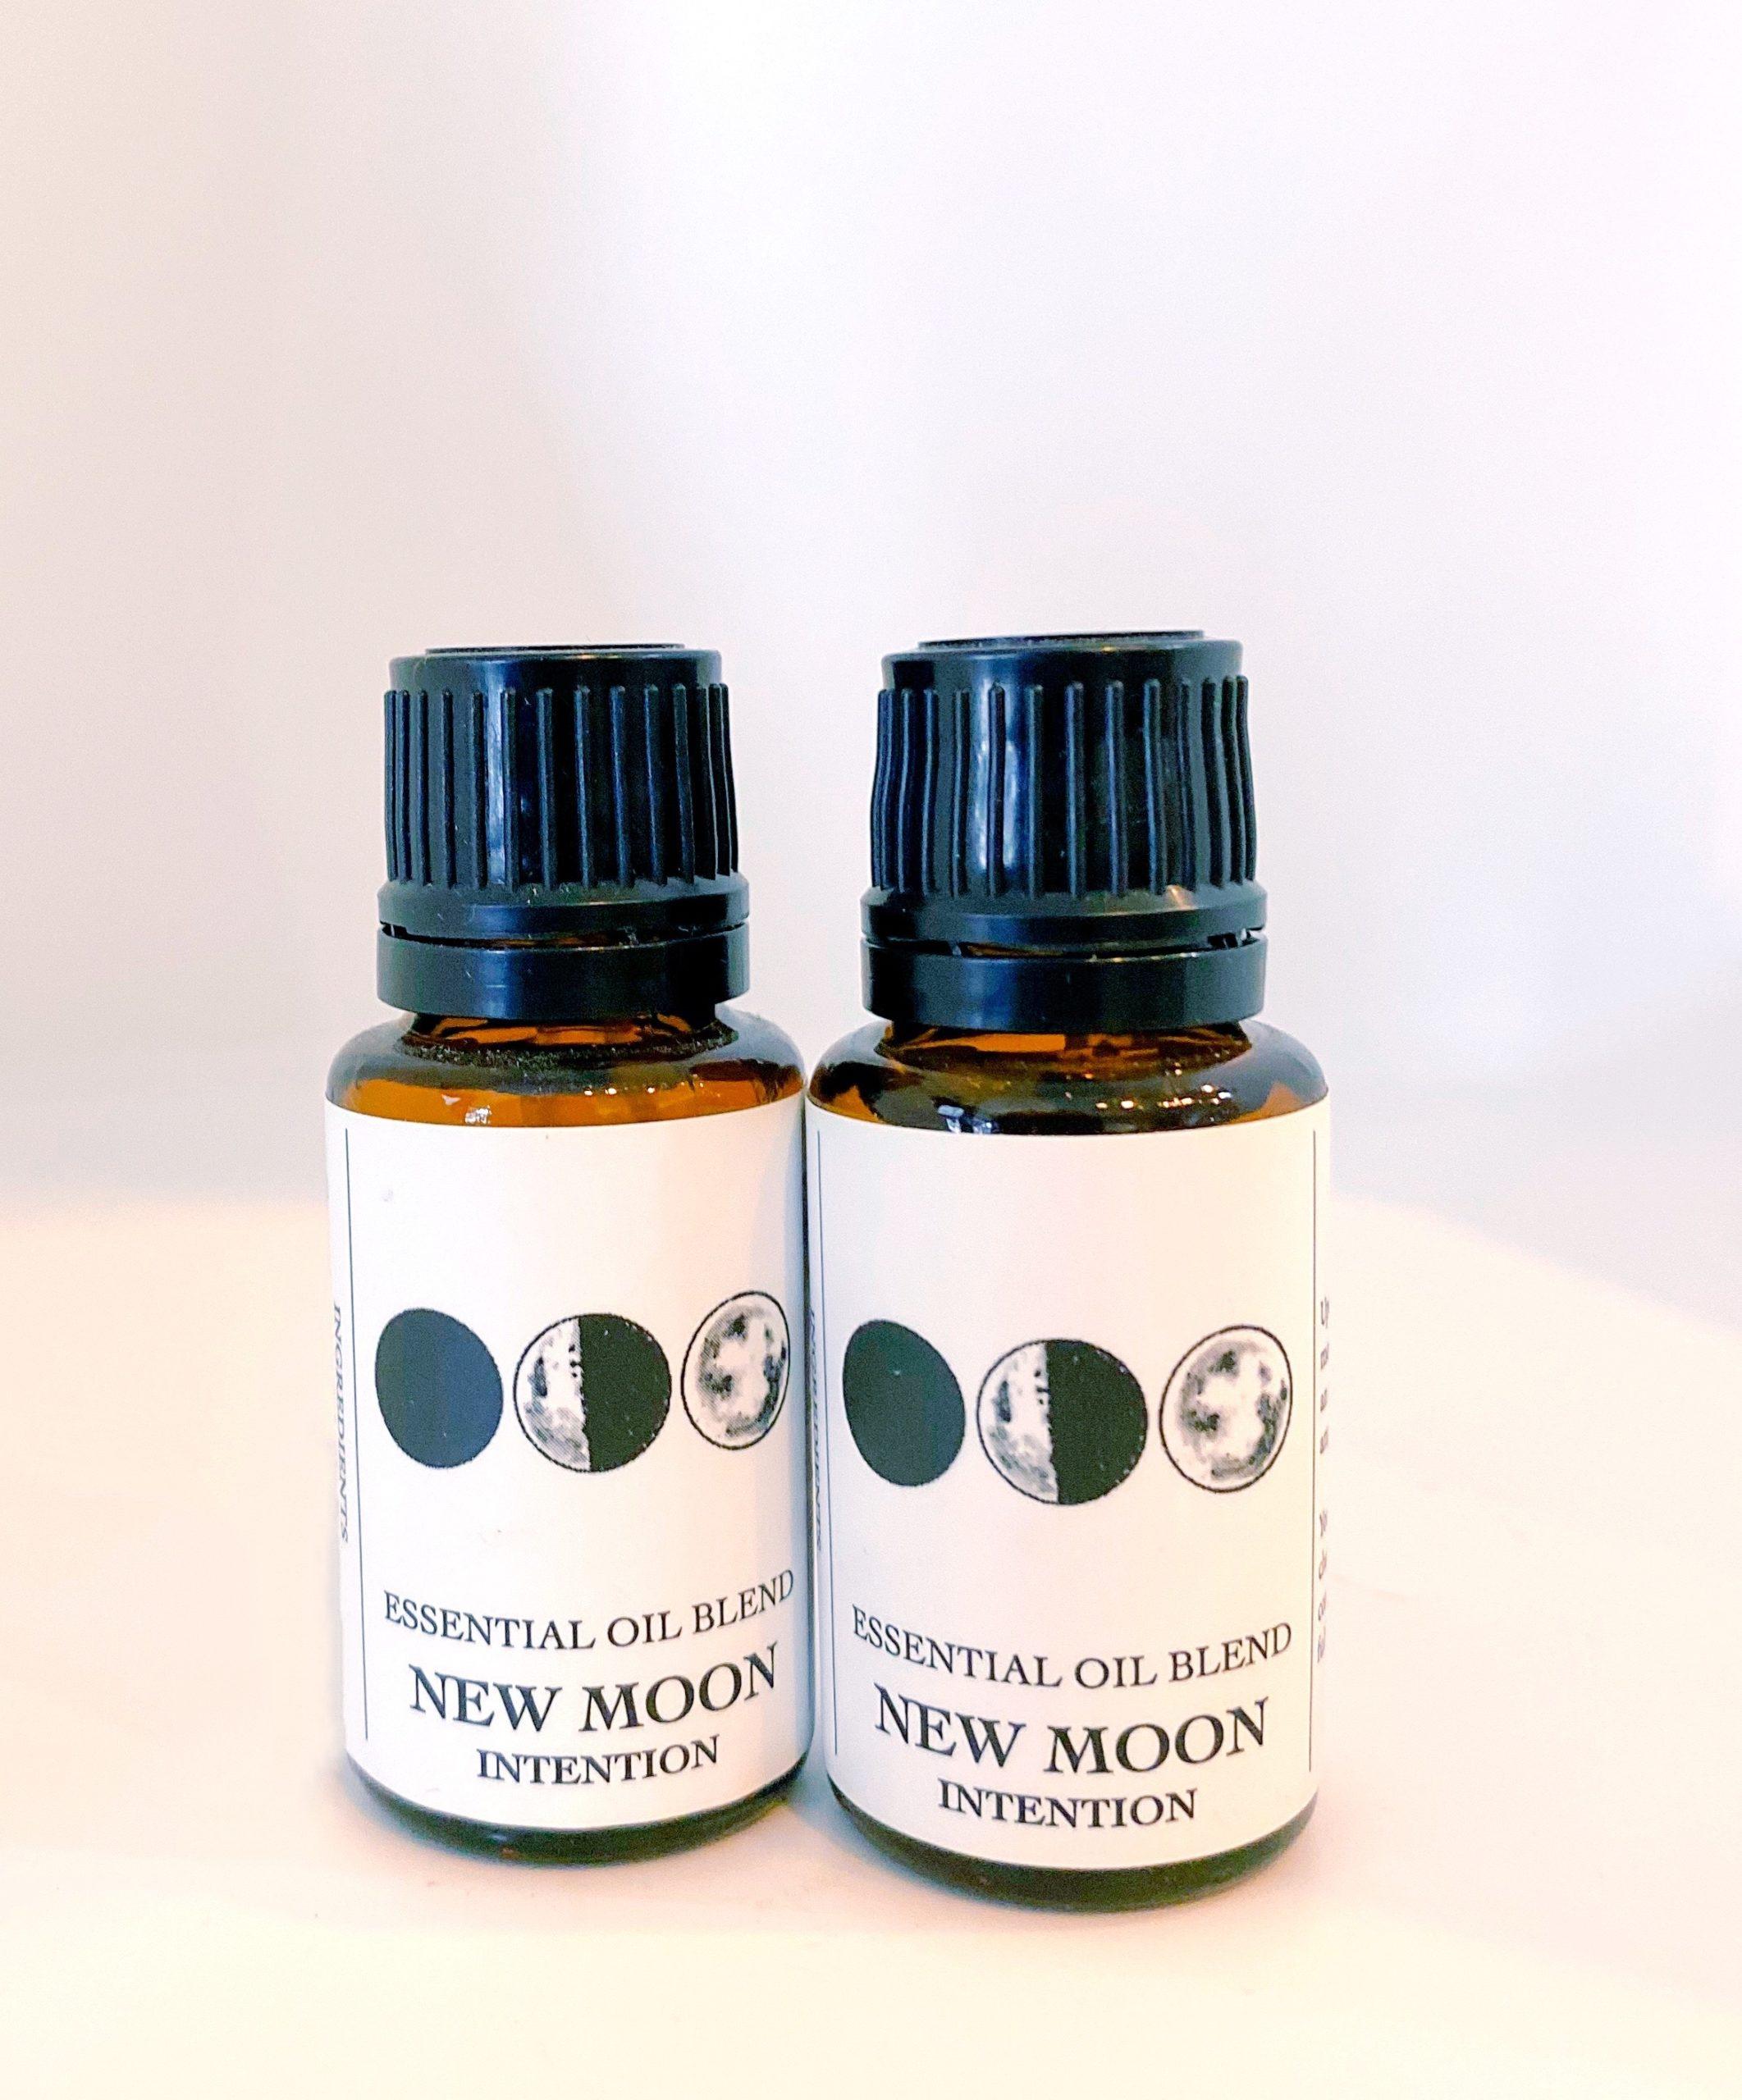 New Moon Oil | Rosemary, Orange, Tea Tree, Peppermint